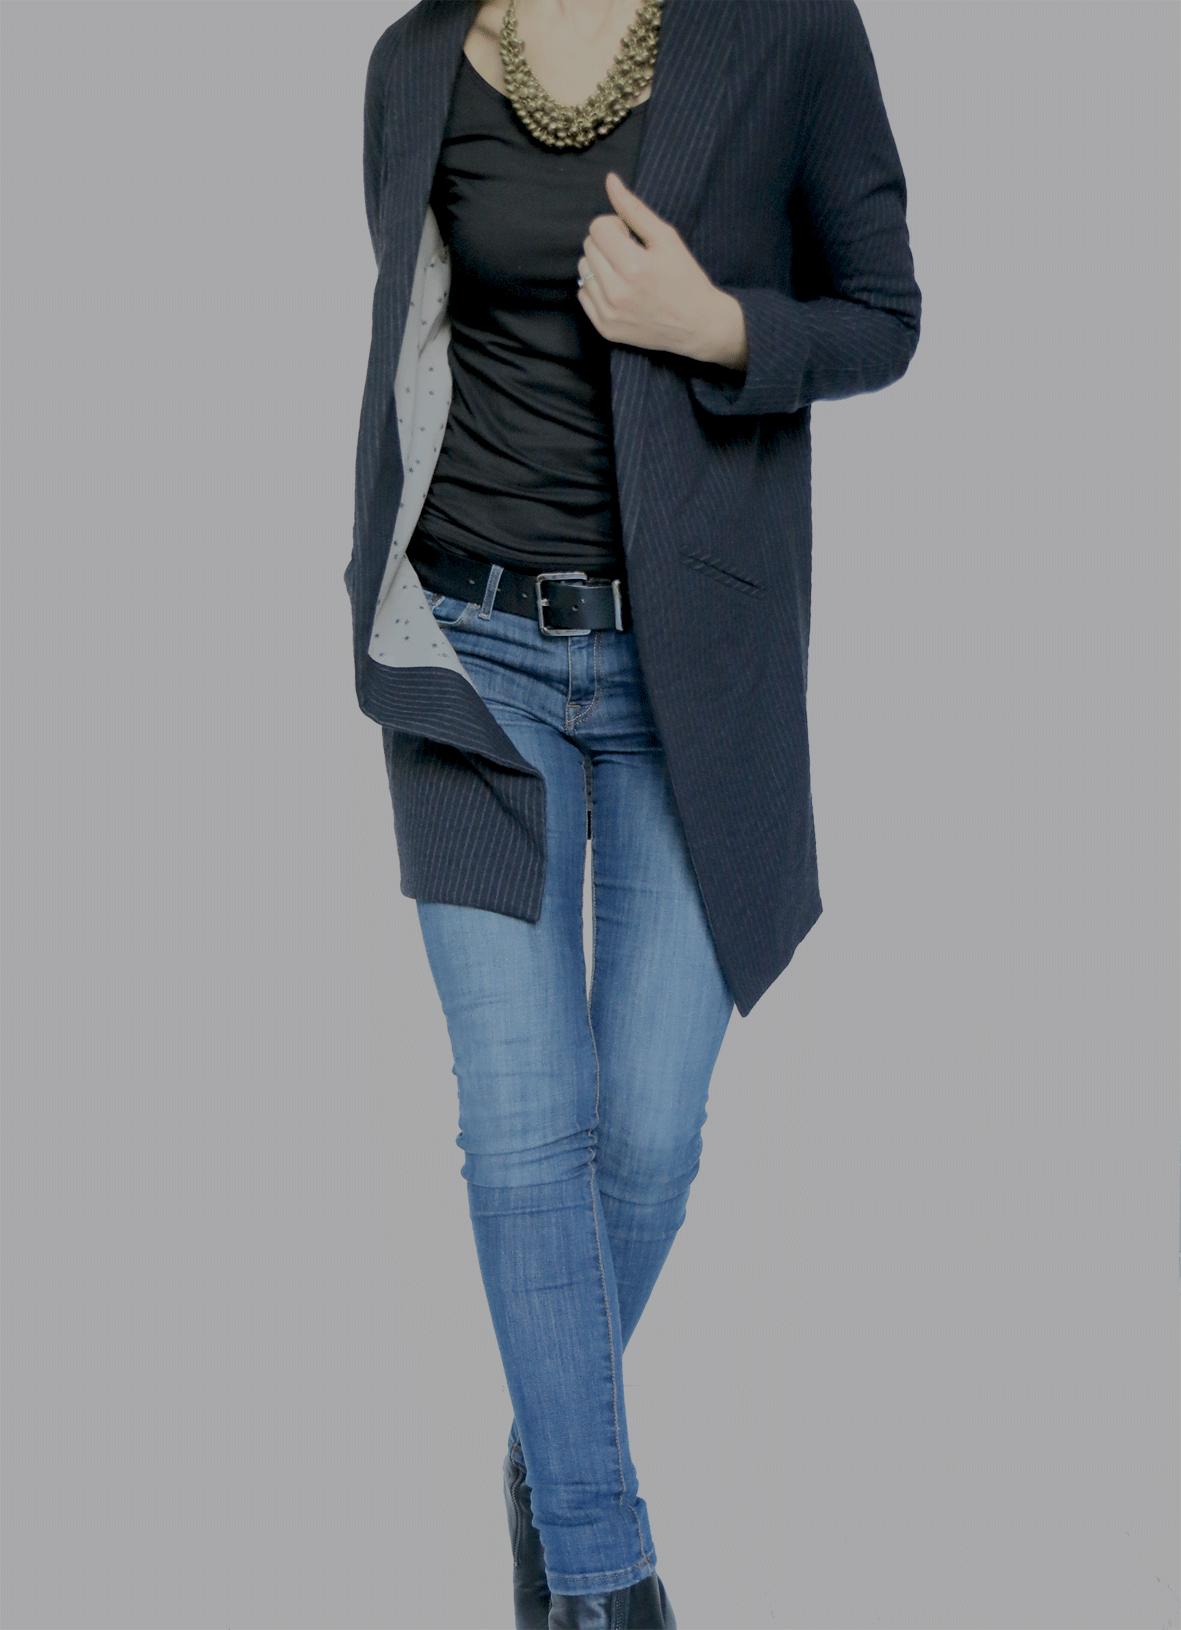 10-manteau-franceduvalstalla-patron-couture-atelier-scammit